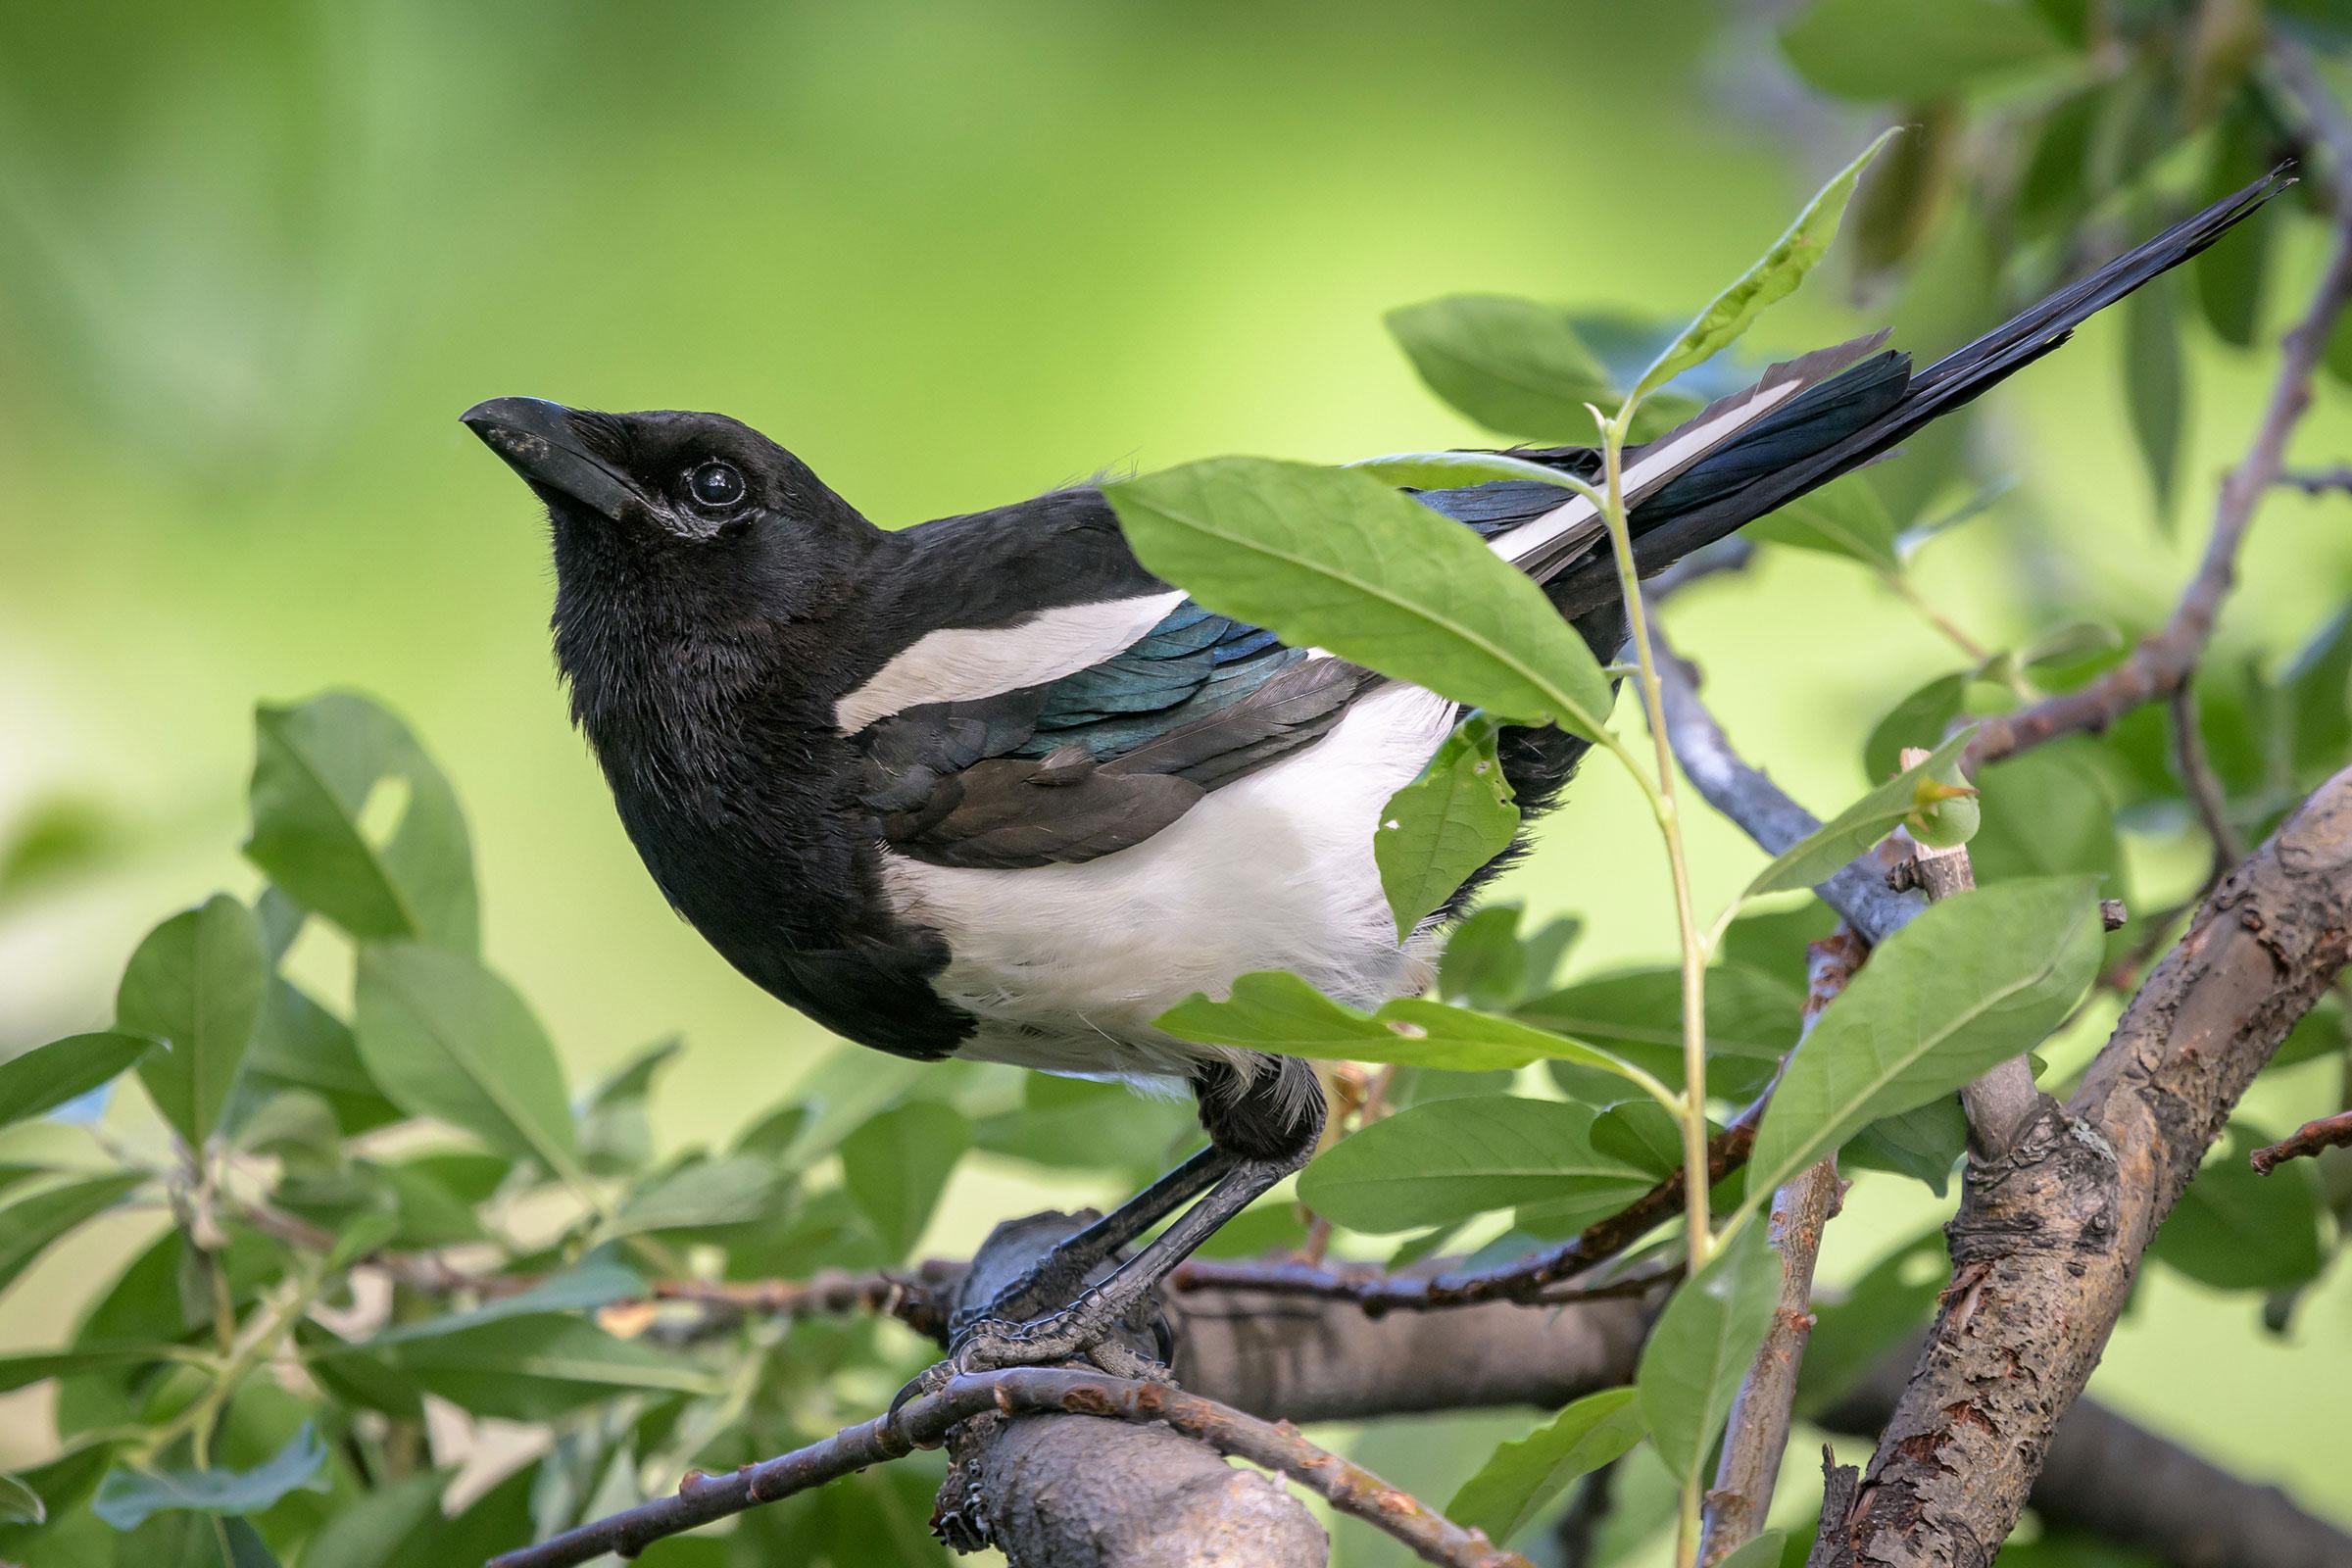 Black-billed Magpie. Becky Matsubara/Flickr (CC-BY-2.0)